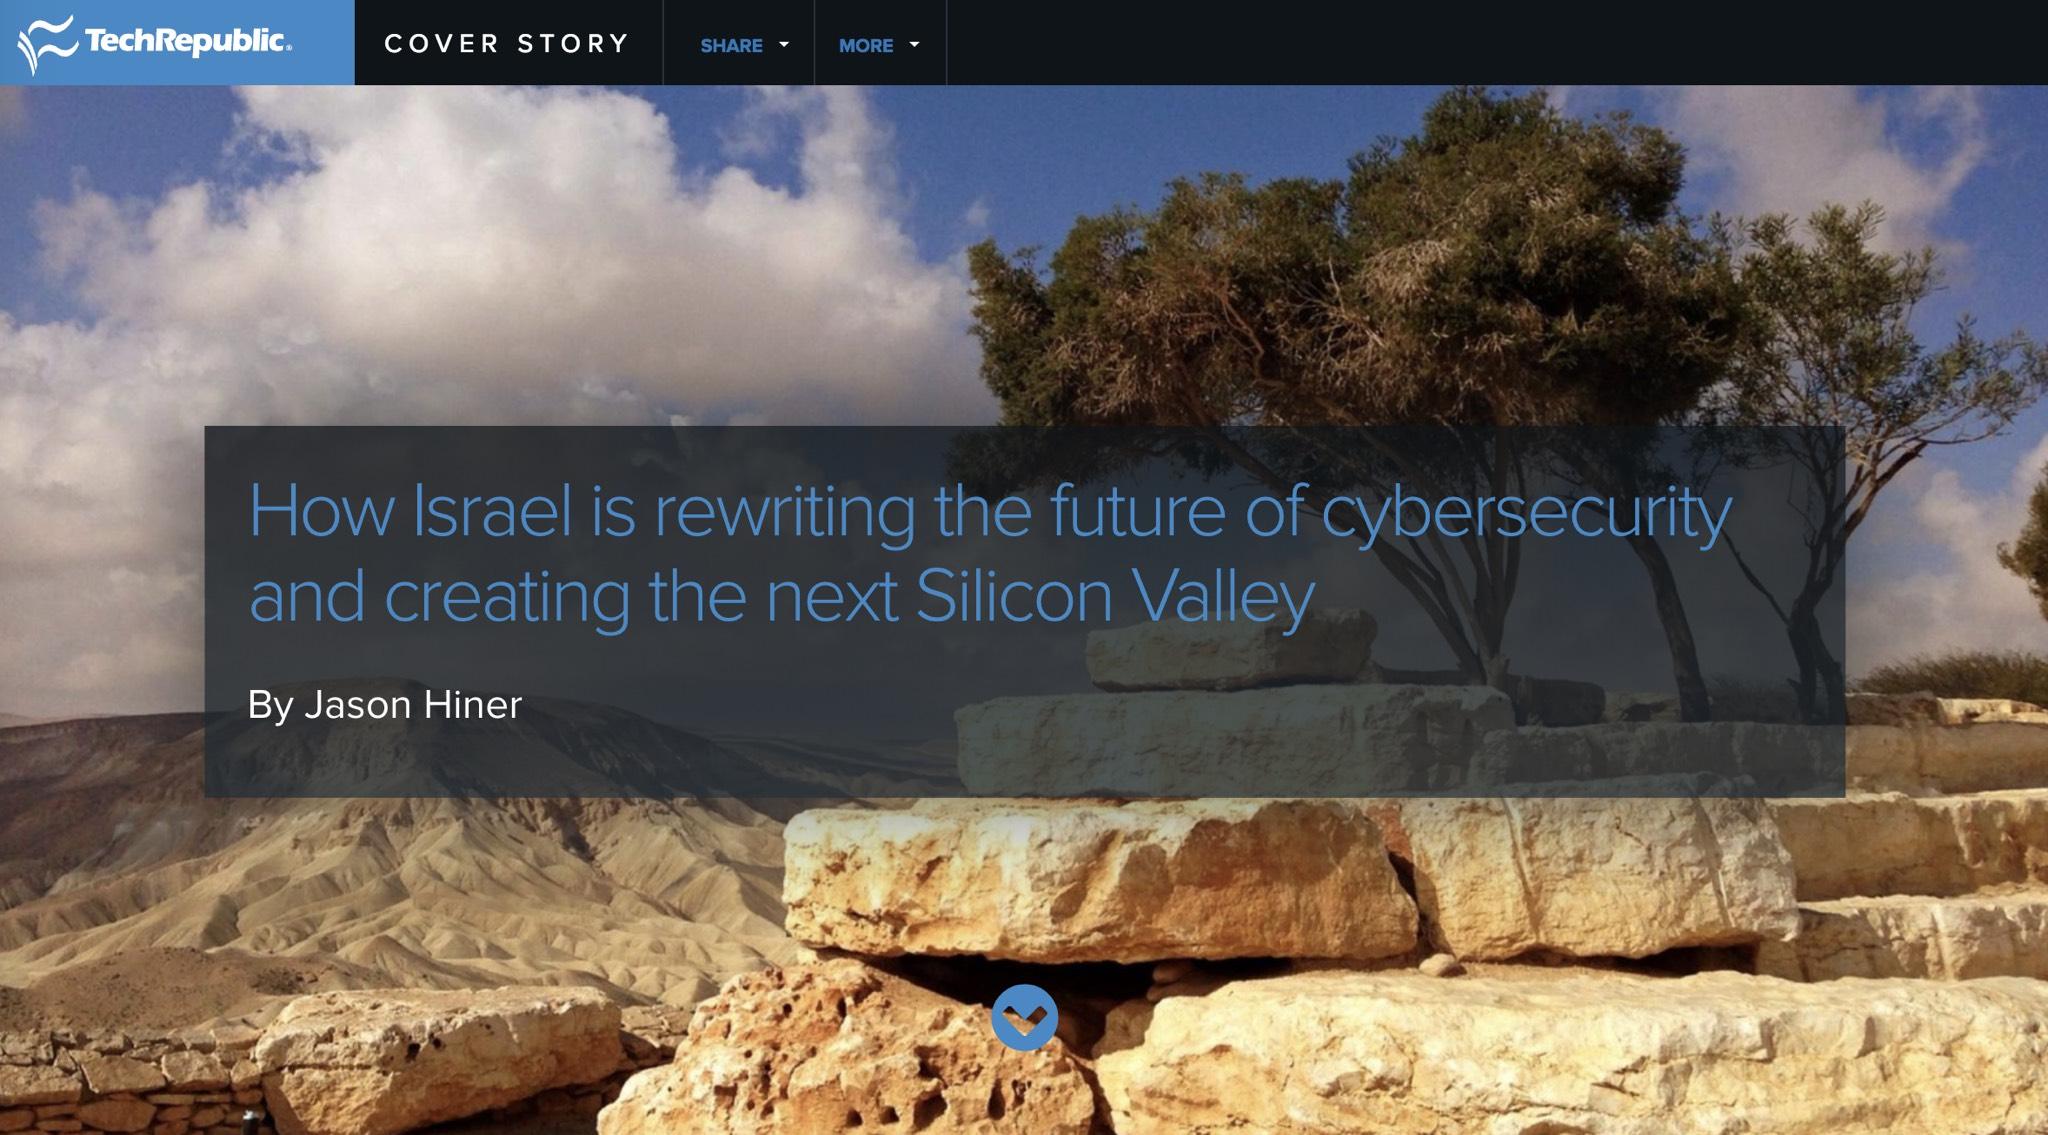 hiner-israel-cover-story.jpg